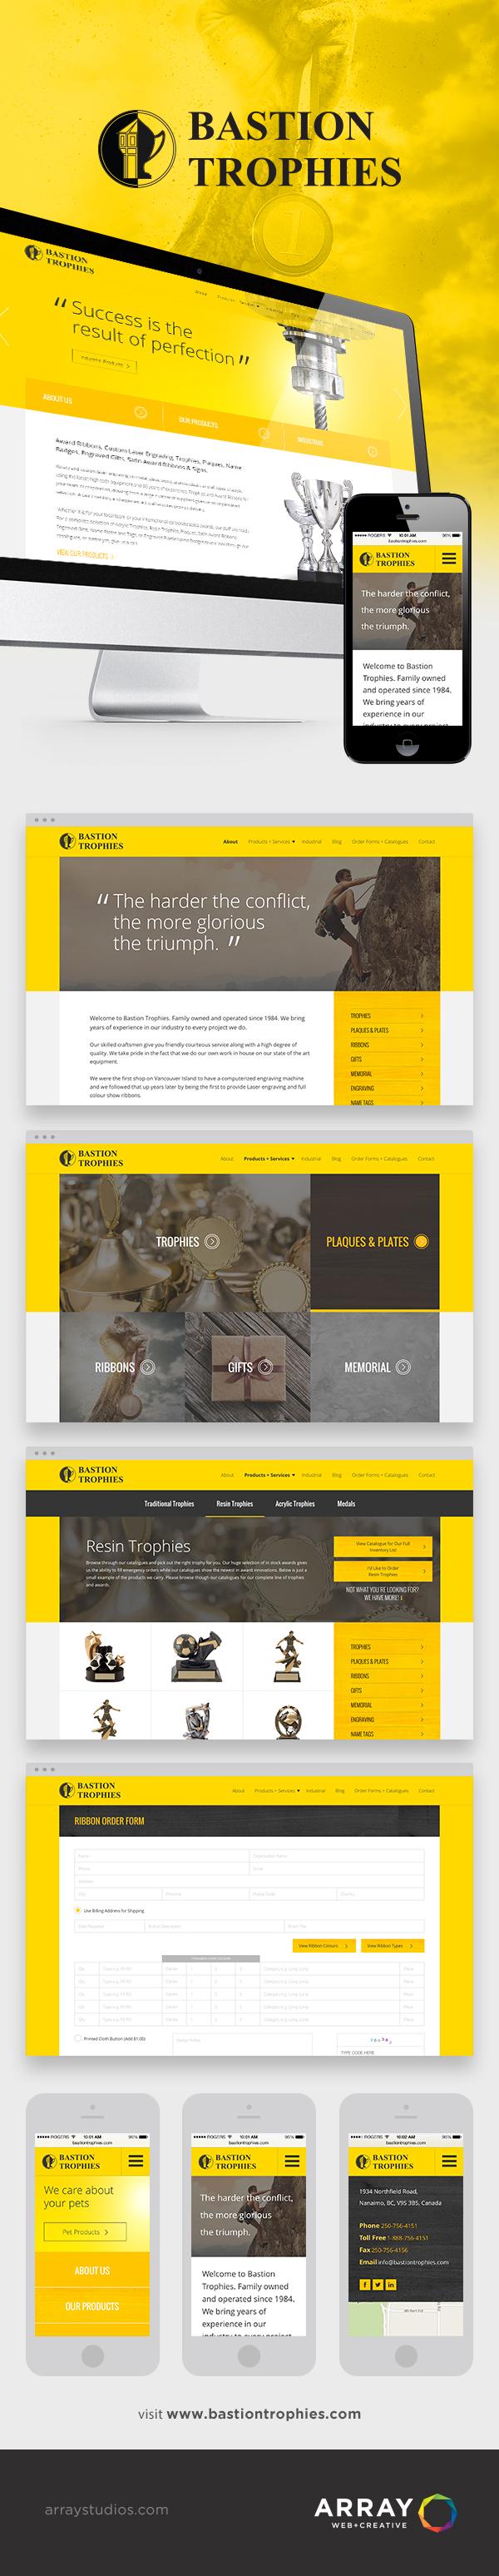 Web Design Bastion Trophies Array Web Creative Nanaimo Web Design Responsive Creative Marketing Agency Programming Awards Engraving